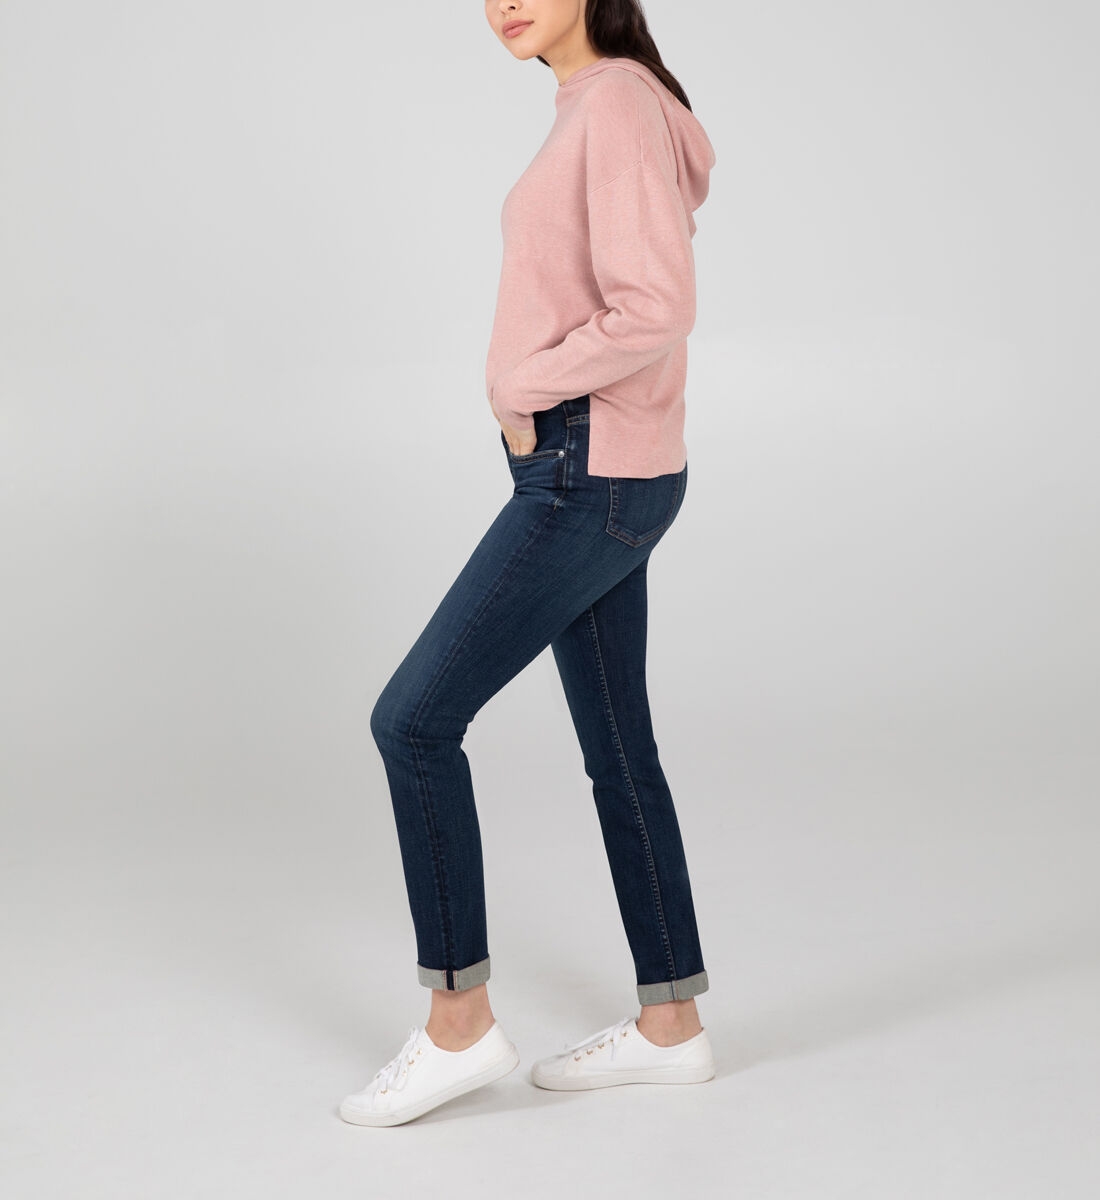 Beau Mid Rise Slim Leg Jeans Side